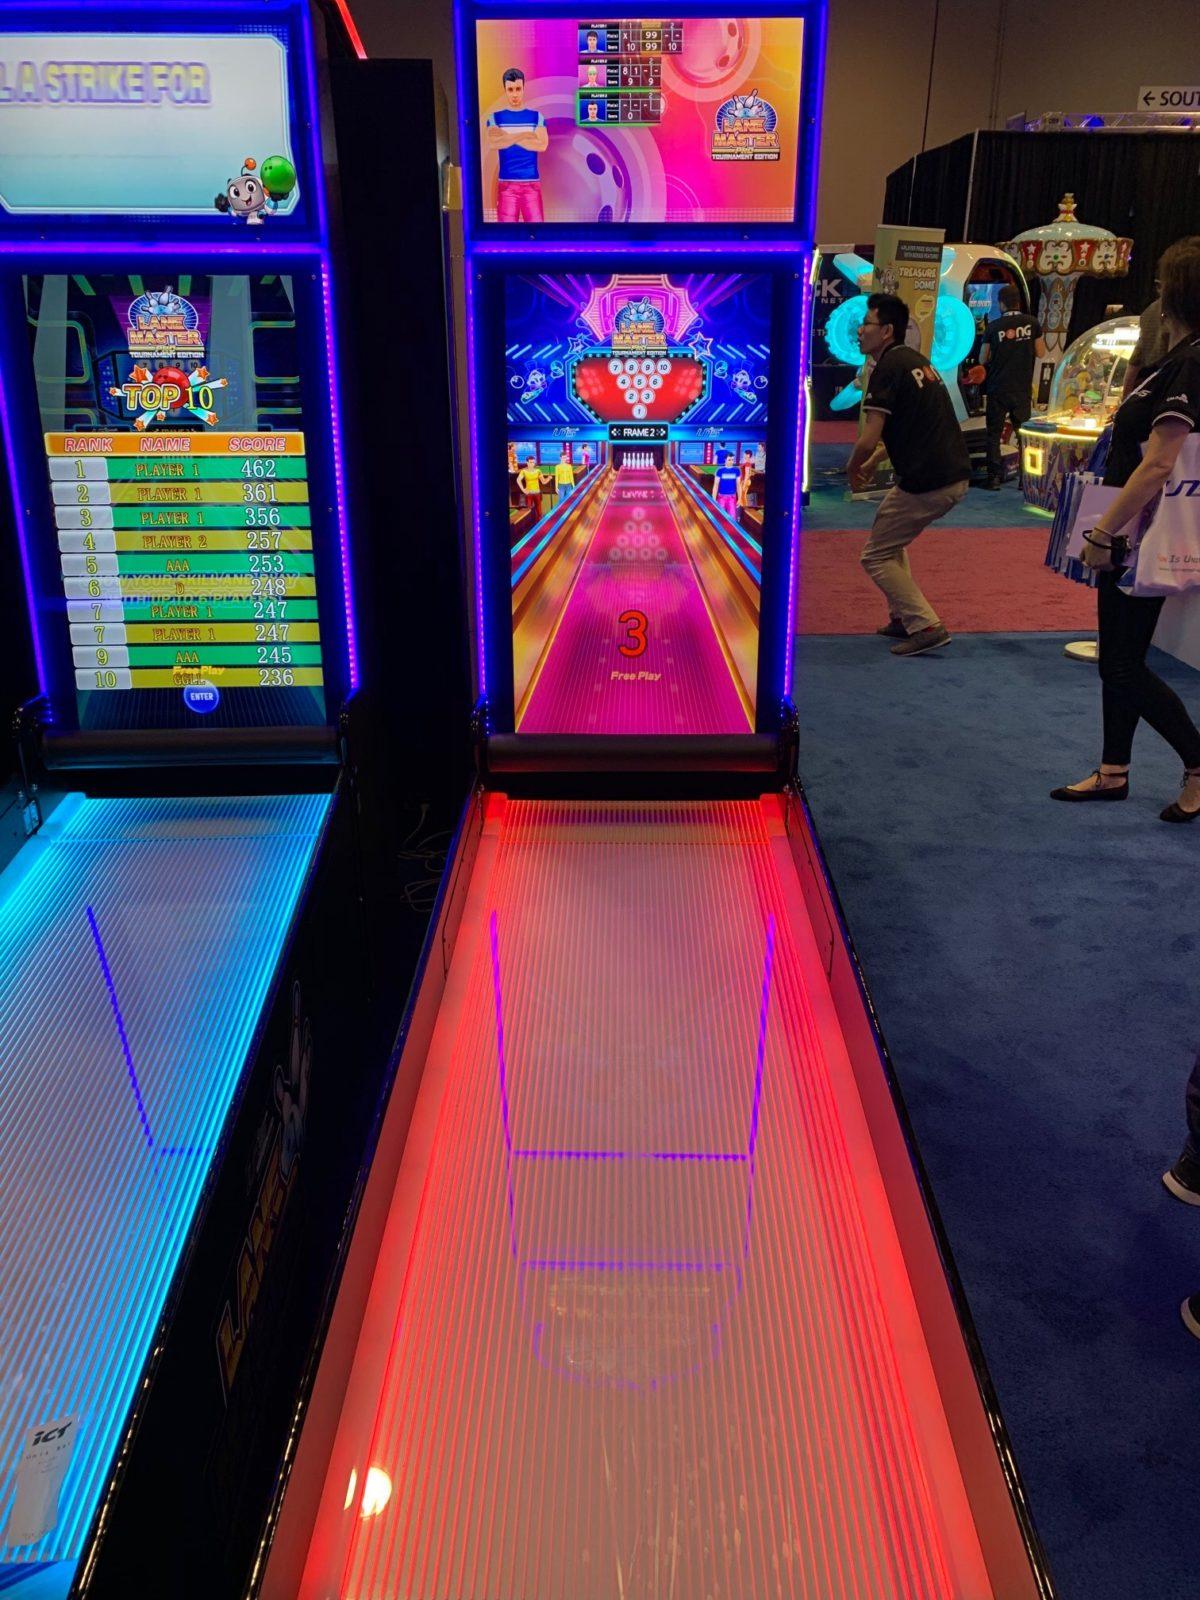 bowling arcade game